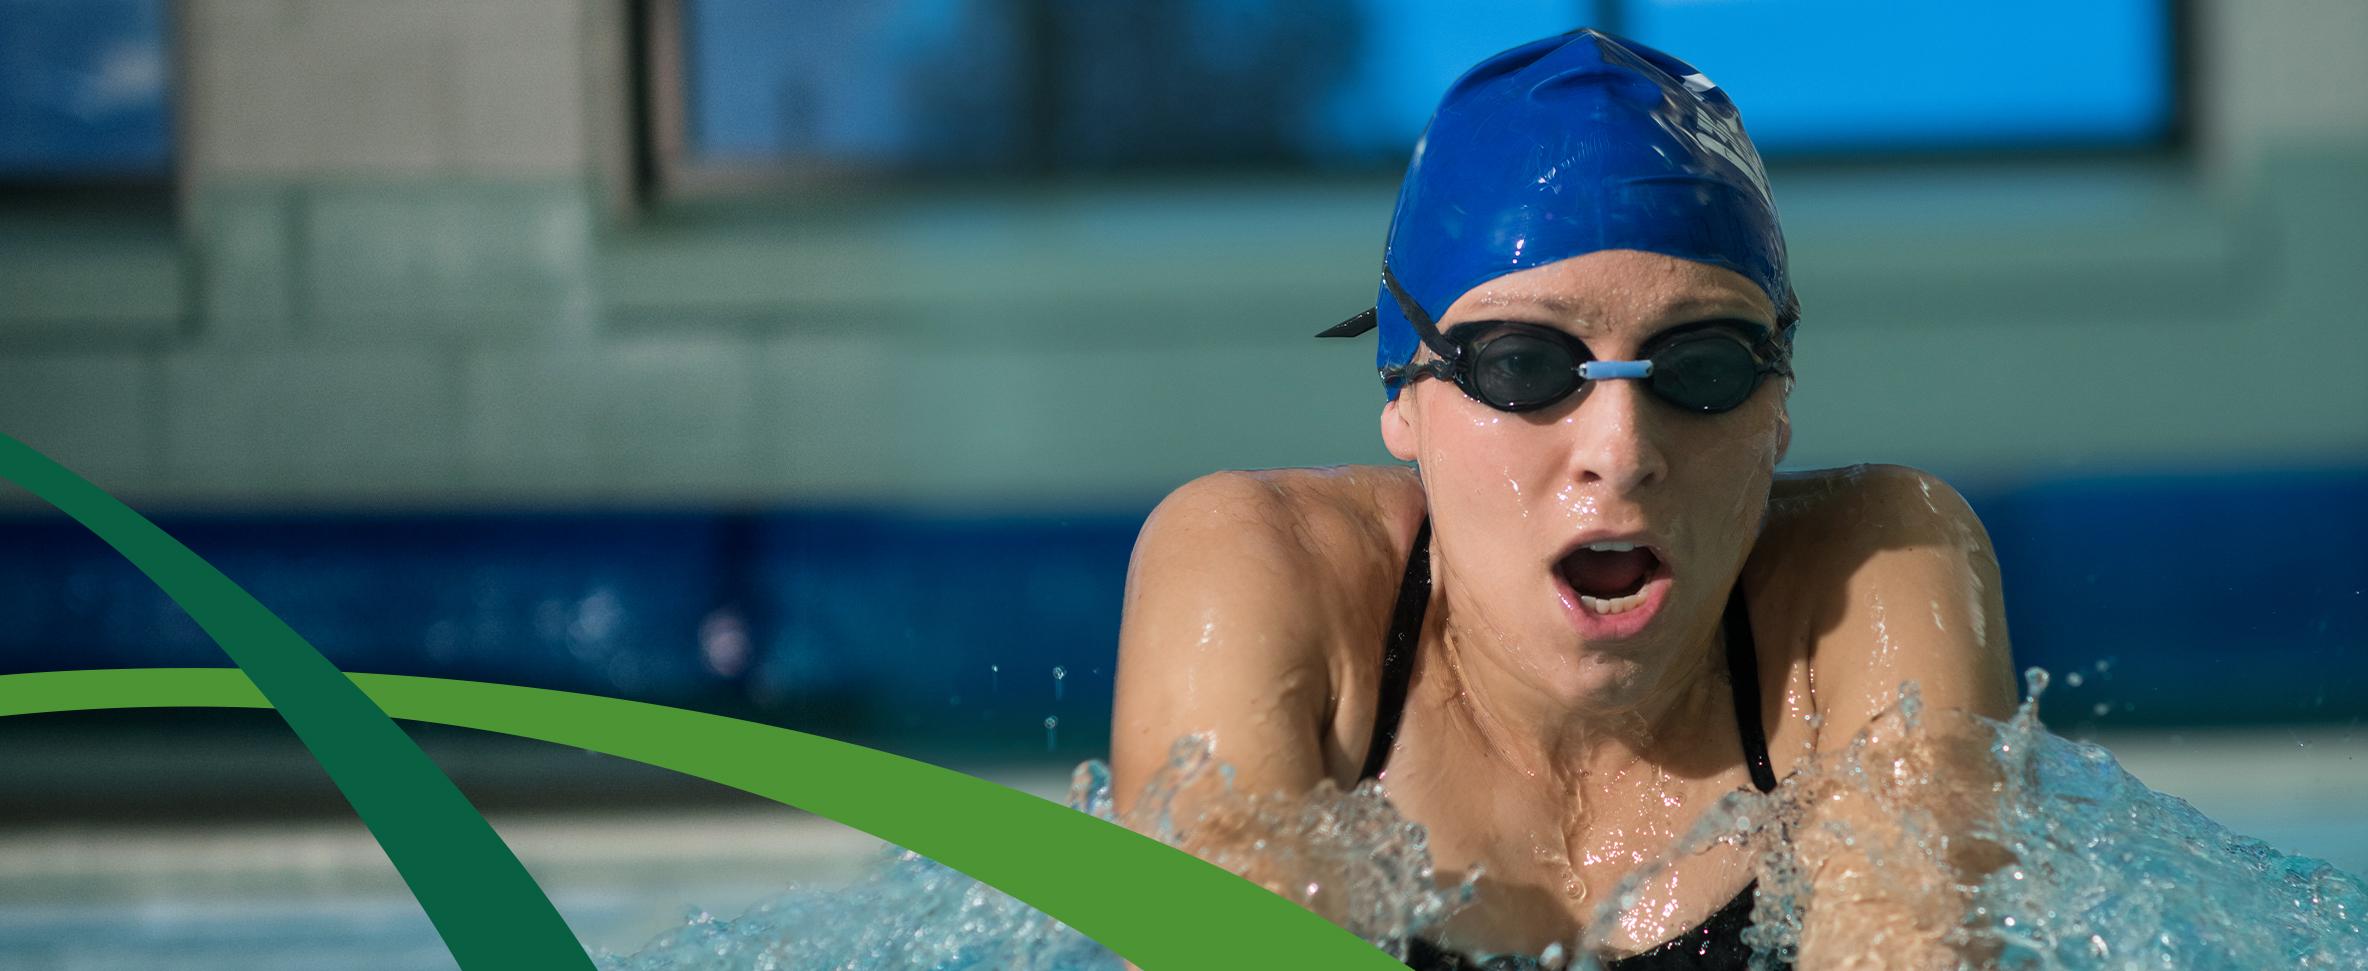 Alison M. Migonis, DPM, CVMC Podiatrist, swimming